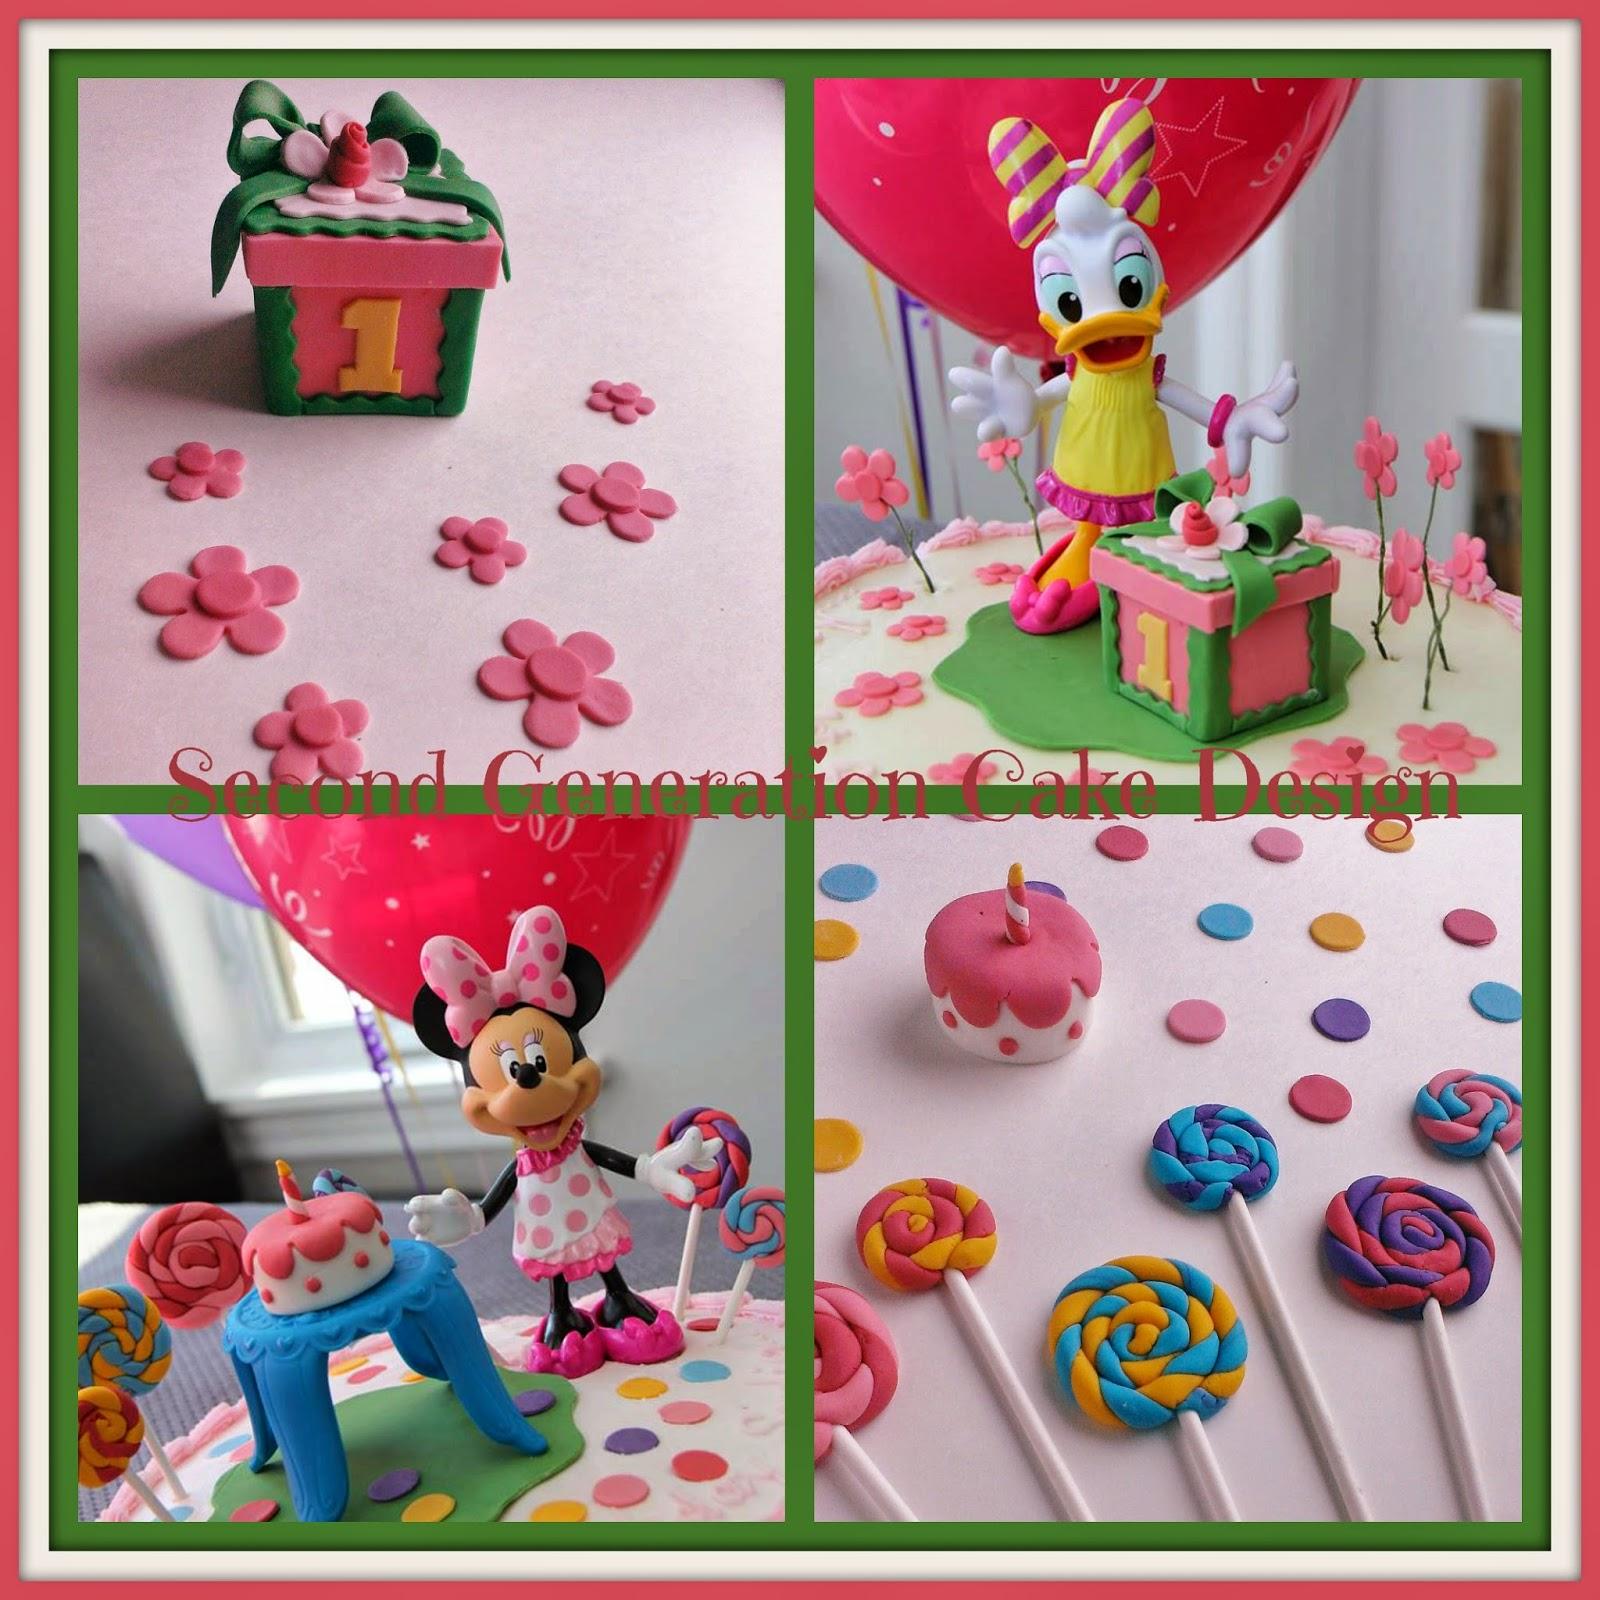 Second Generation Cake Design: Minnie and Daisy Cake ...